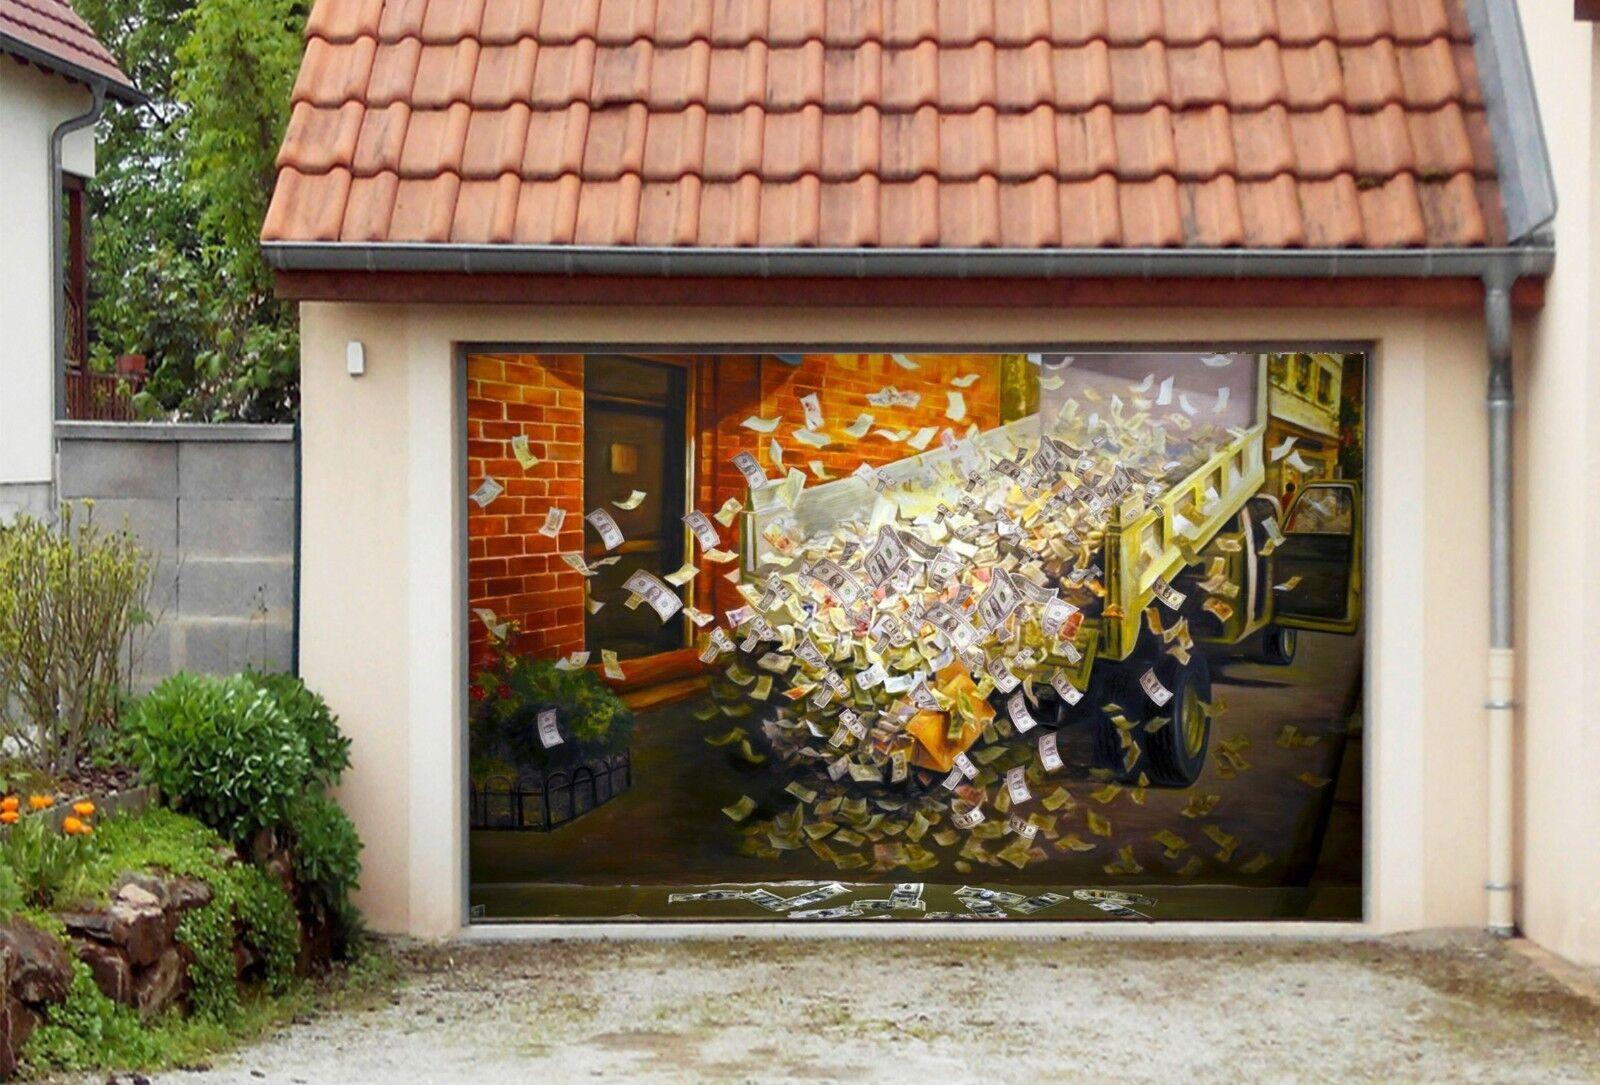 3D Money Car 905 Garage Door Murals Wall Print Decal Wall AJ WALLPAPER UK Carly